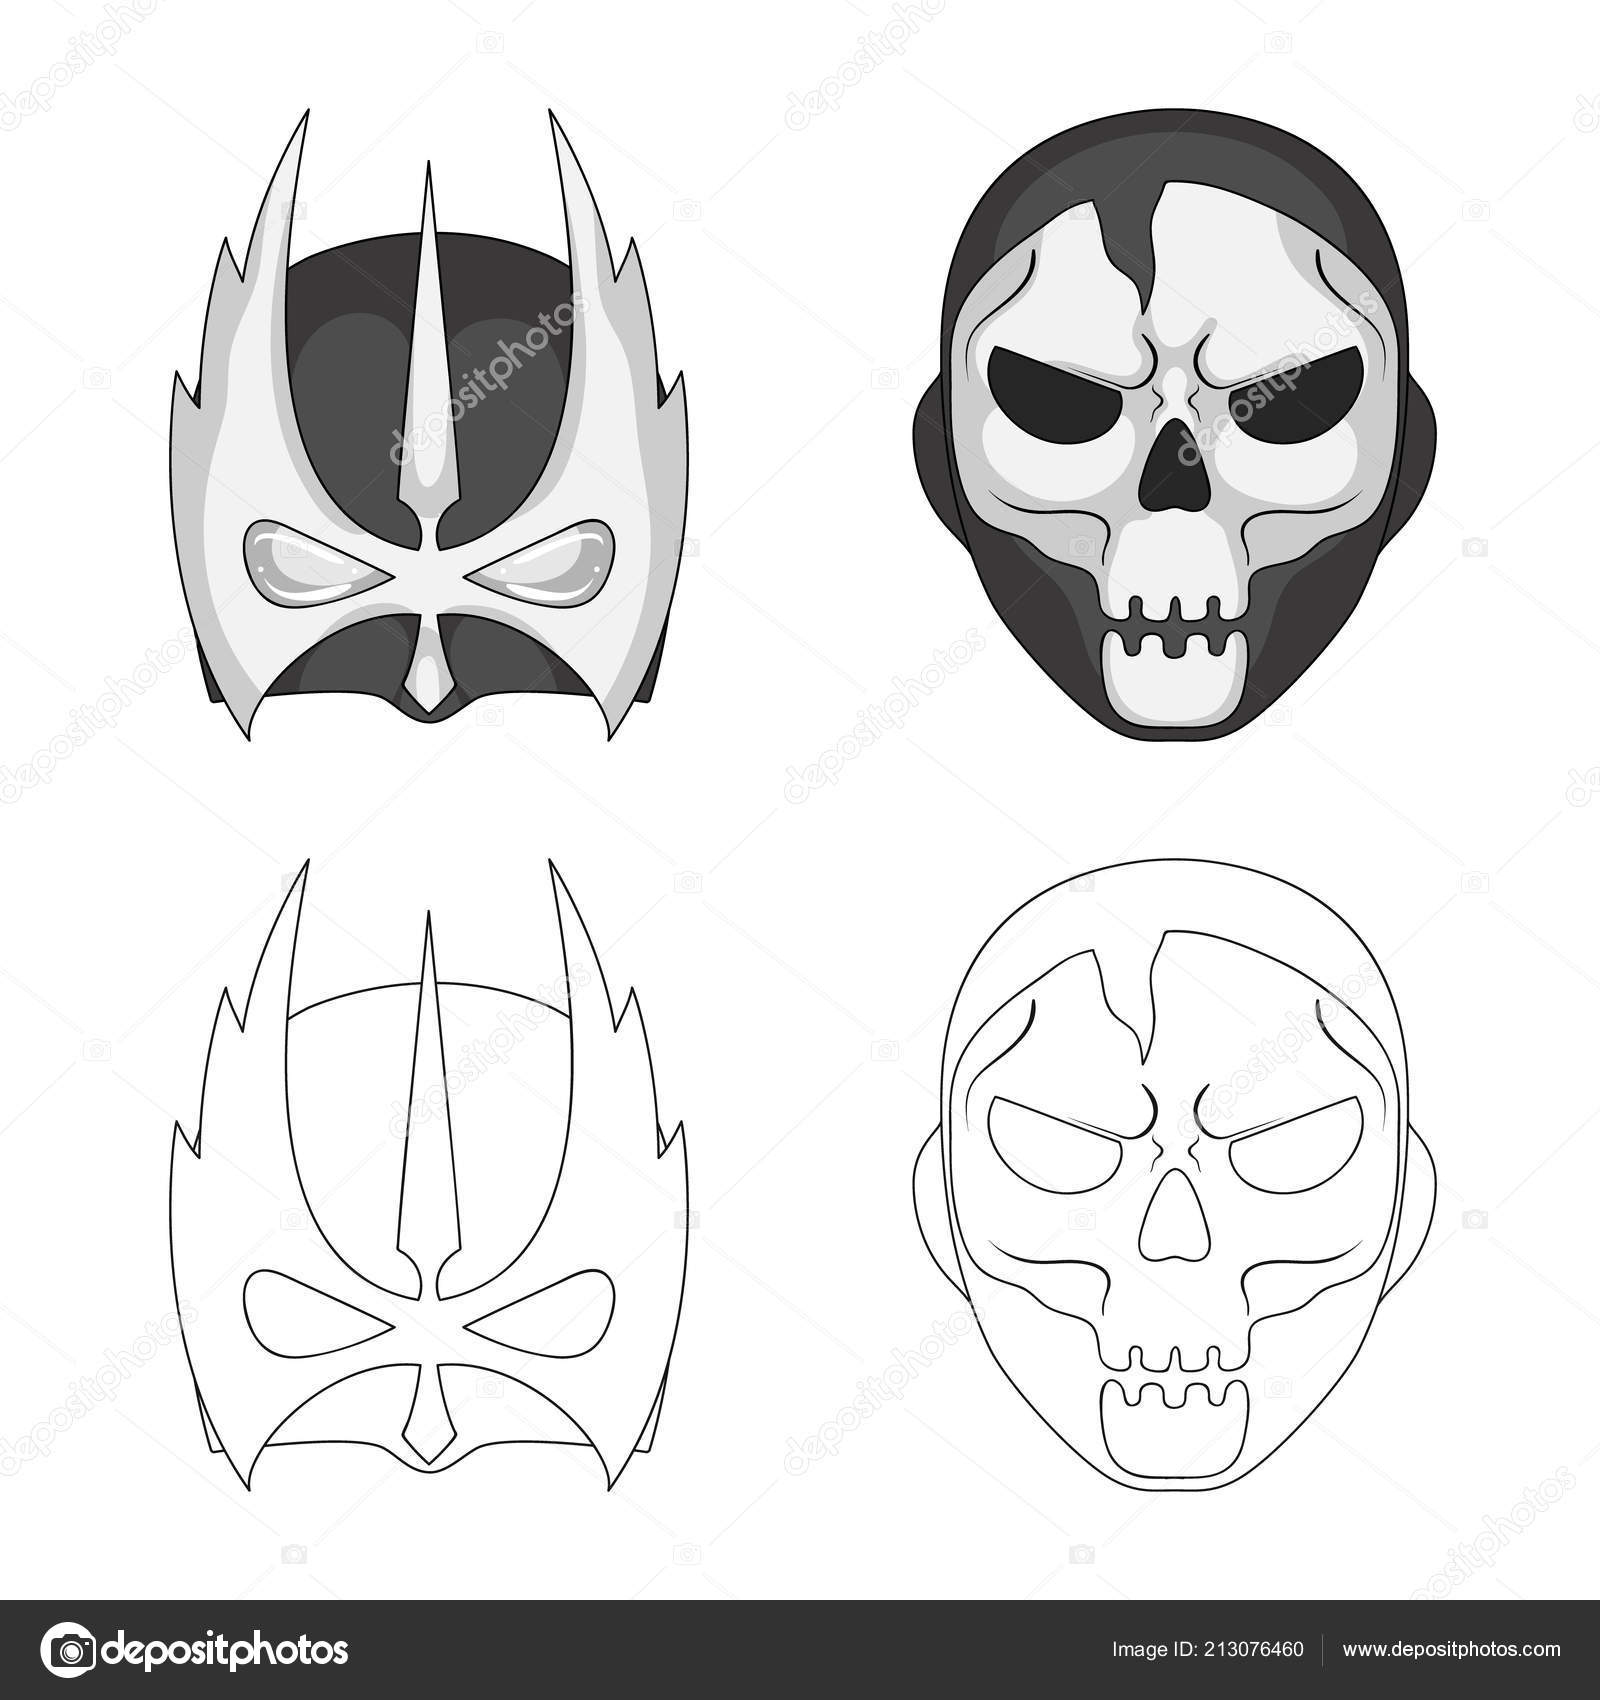 Isolated Object Of Hero And Mask Symbol Set Of Hero And Superhero